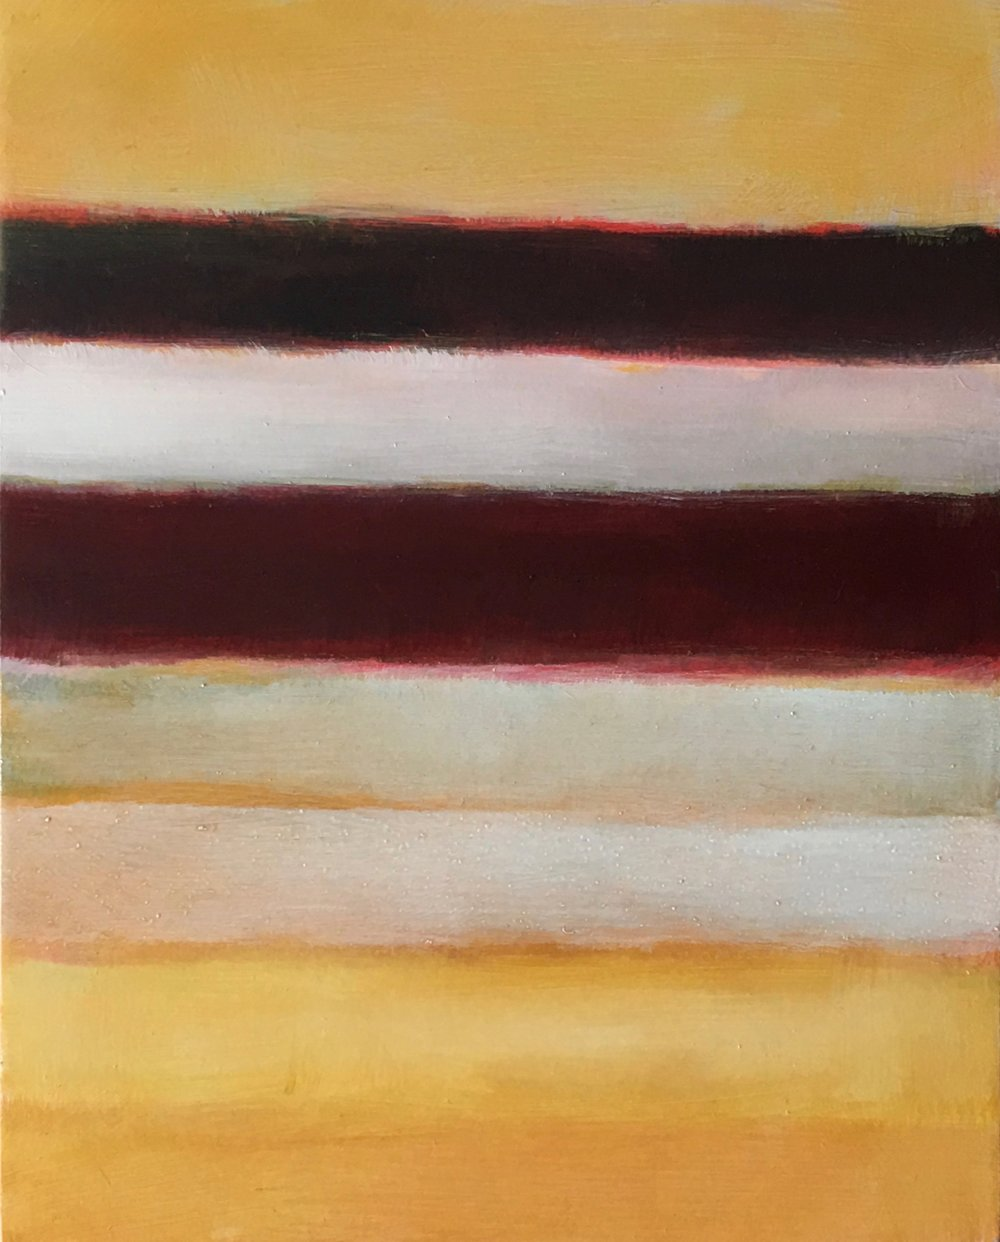 "Open Horizontal  XXIV oil on wood panel 10"" x 8"" ( 25.4 x 20.3 cm ) 2018"